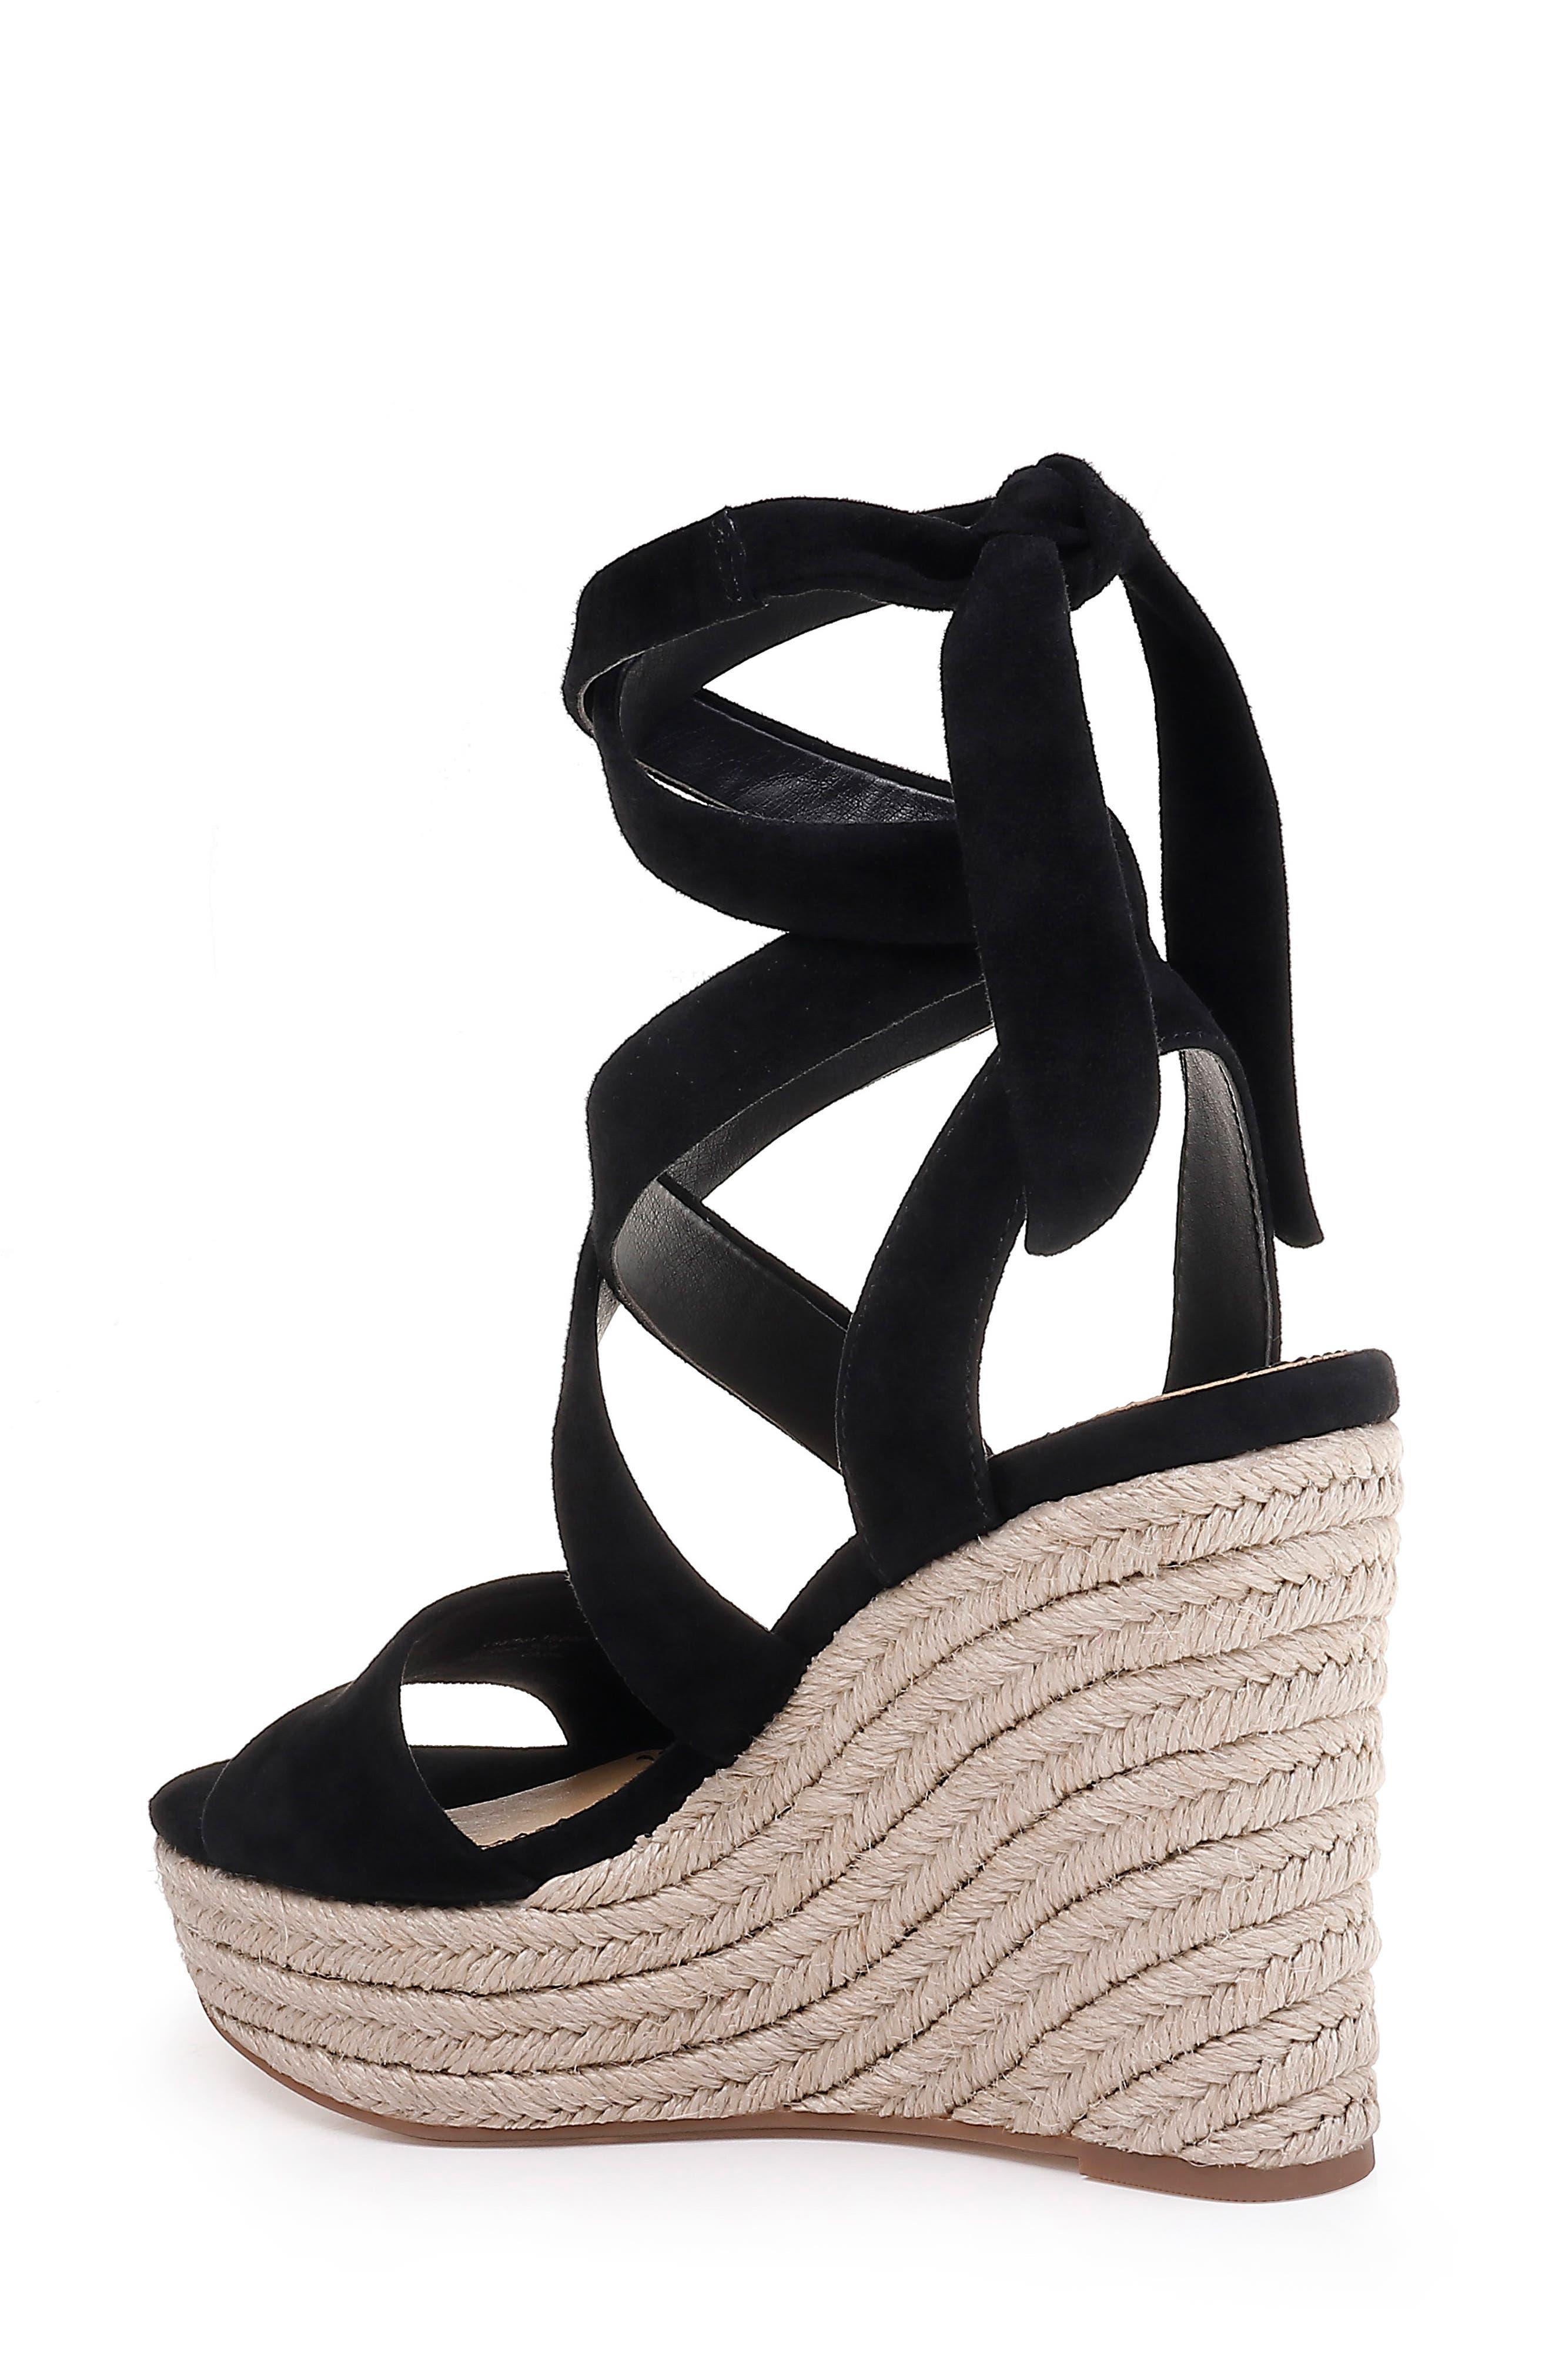 SPLENDID, Tessie Ankle Wrap Wedge Sandal, Alternate thumbnail 2, color, BLACK SUEDE